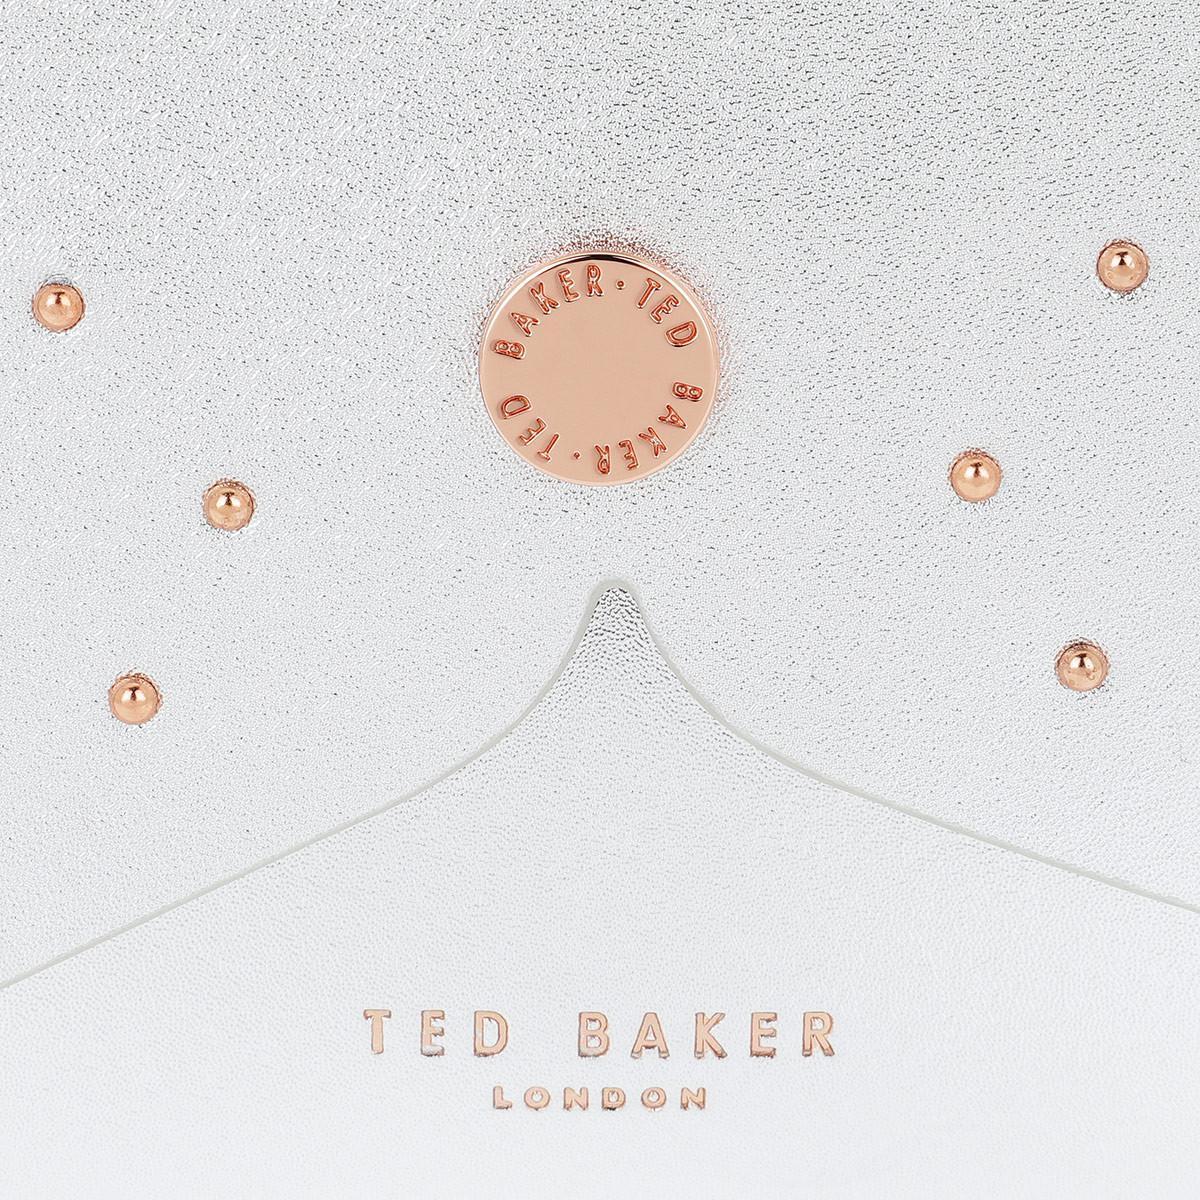 Ted Baker Cotton Barkley Dog Crossbody Bag Silver in Metallic